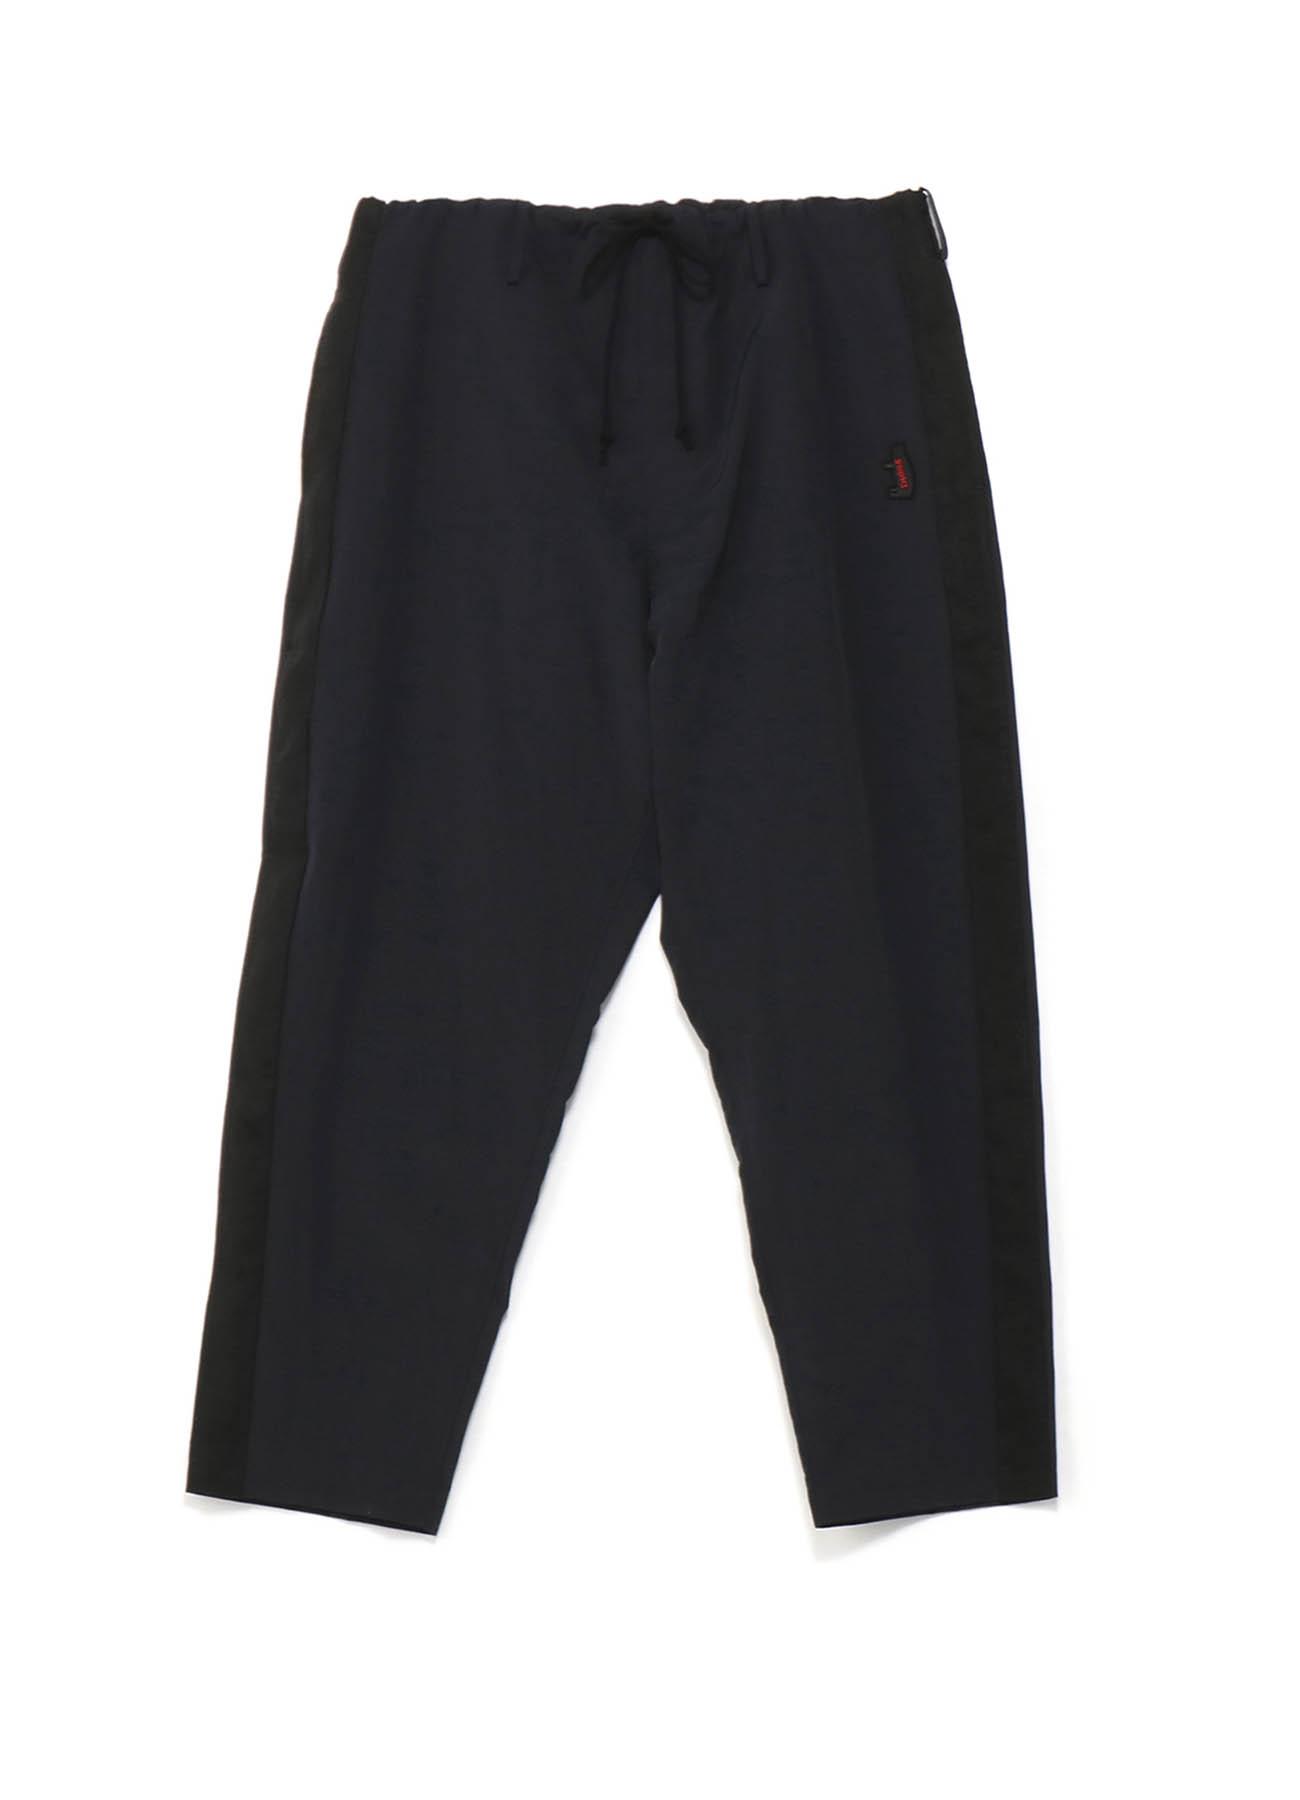 Gipsy 抽绳条纹直筒裤